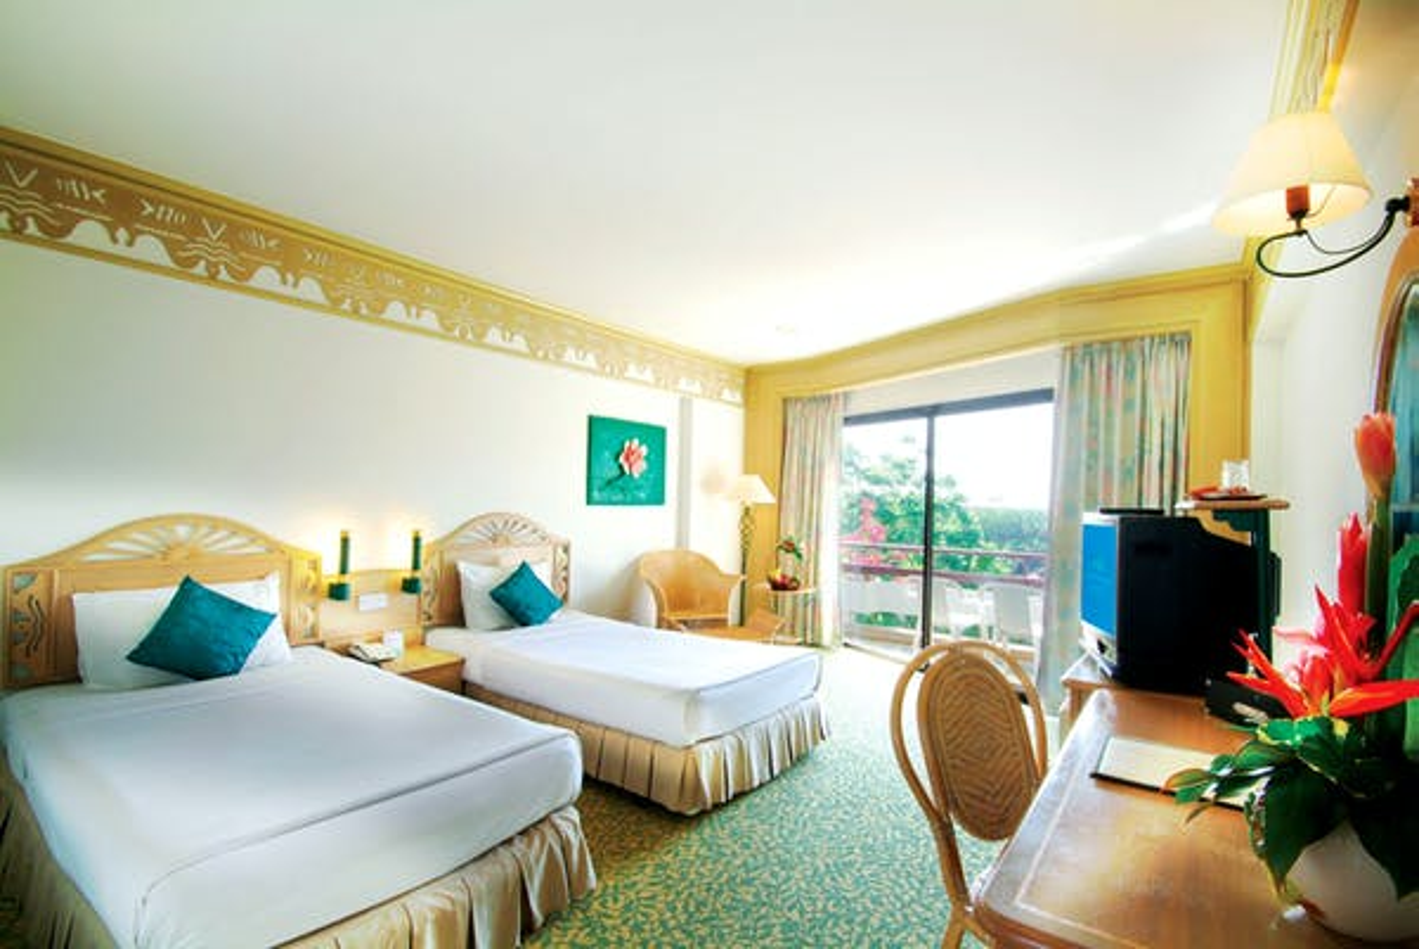 Maritime Park & Spa Resort - Image 1